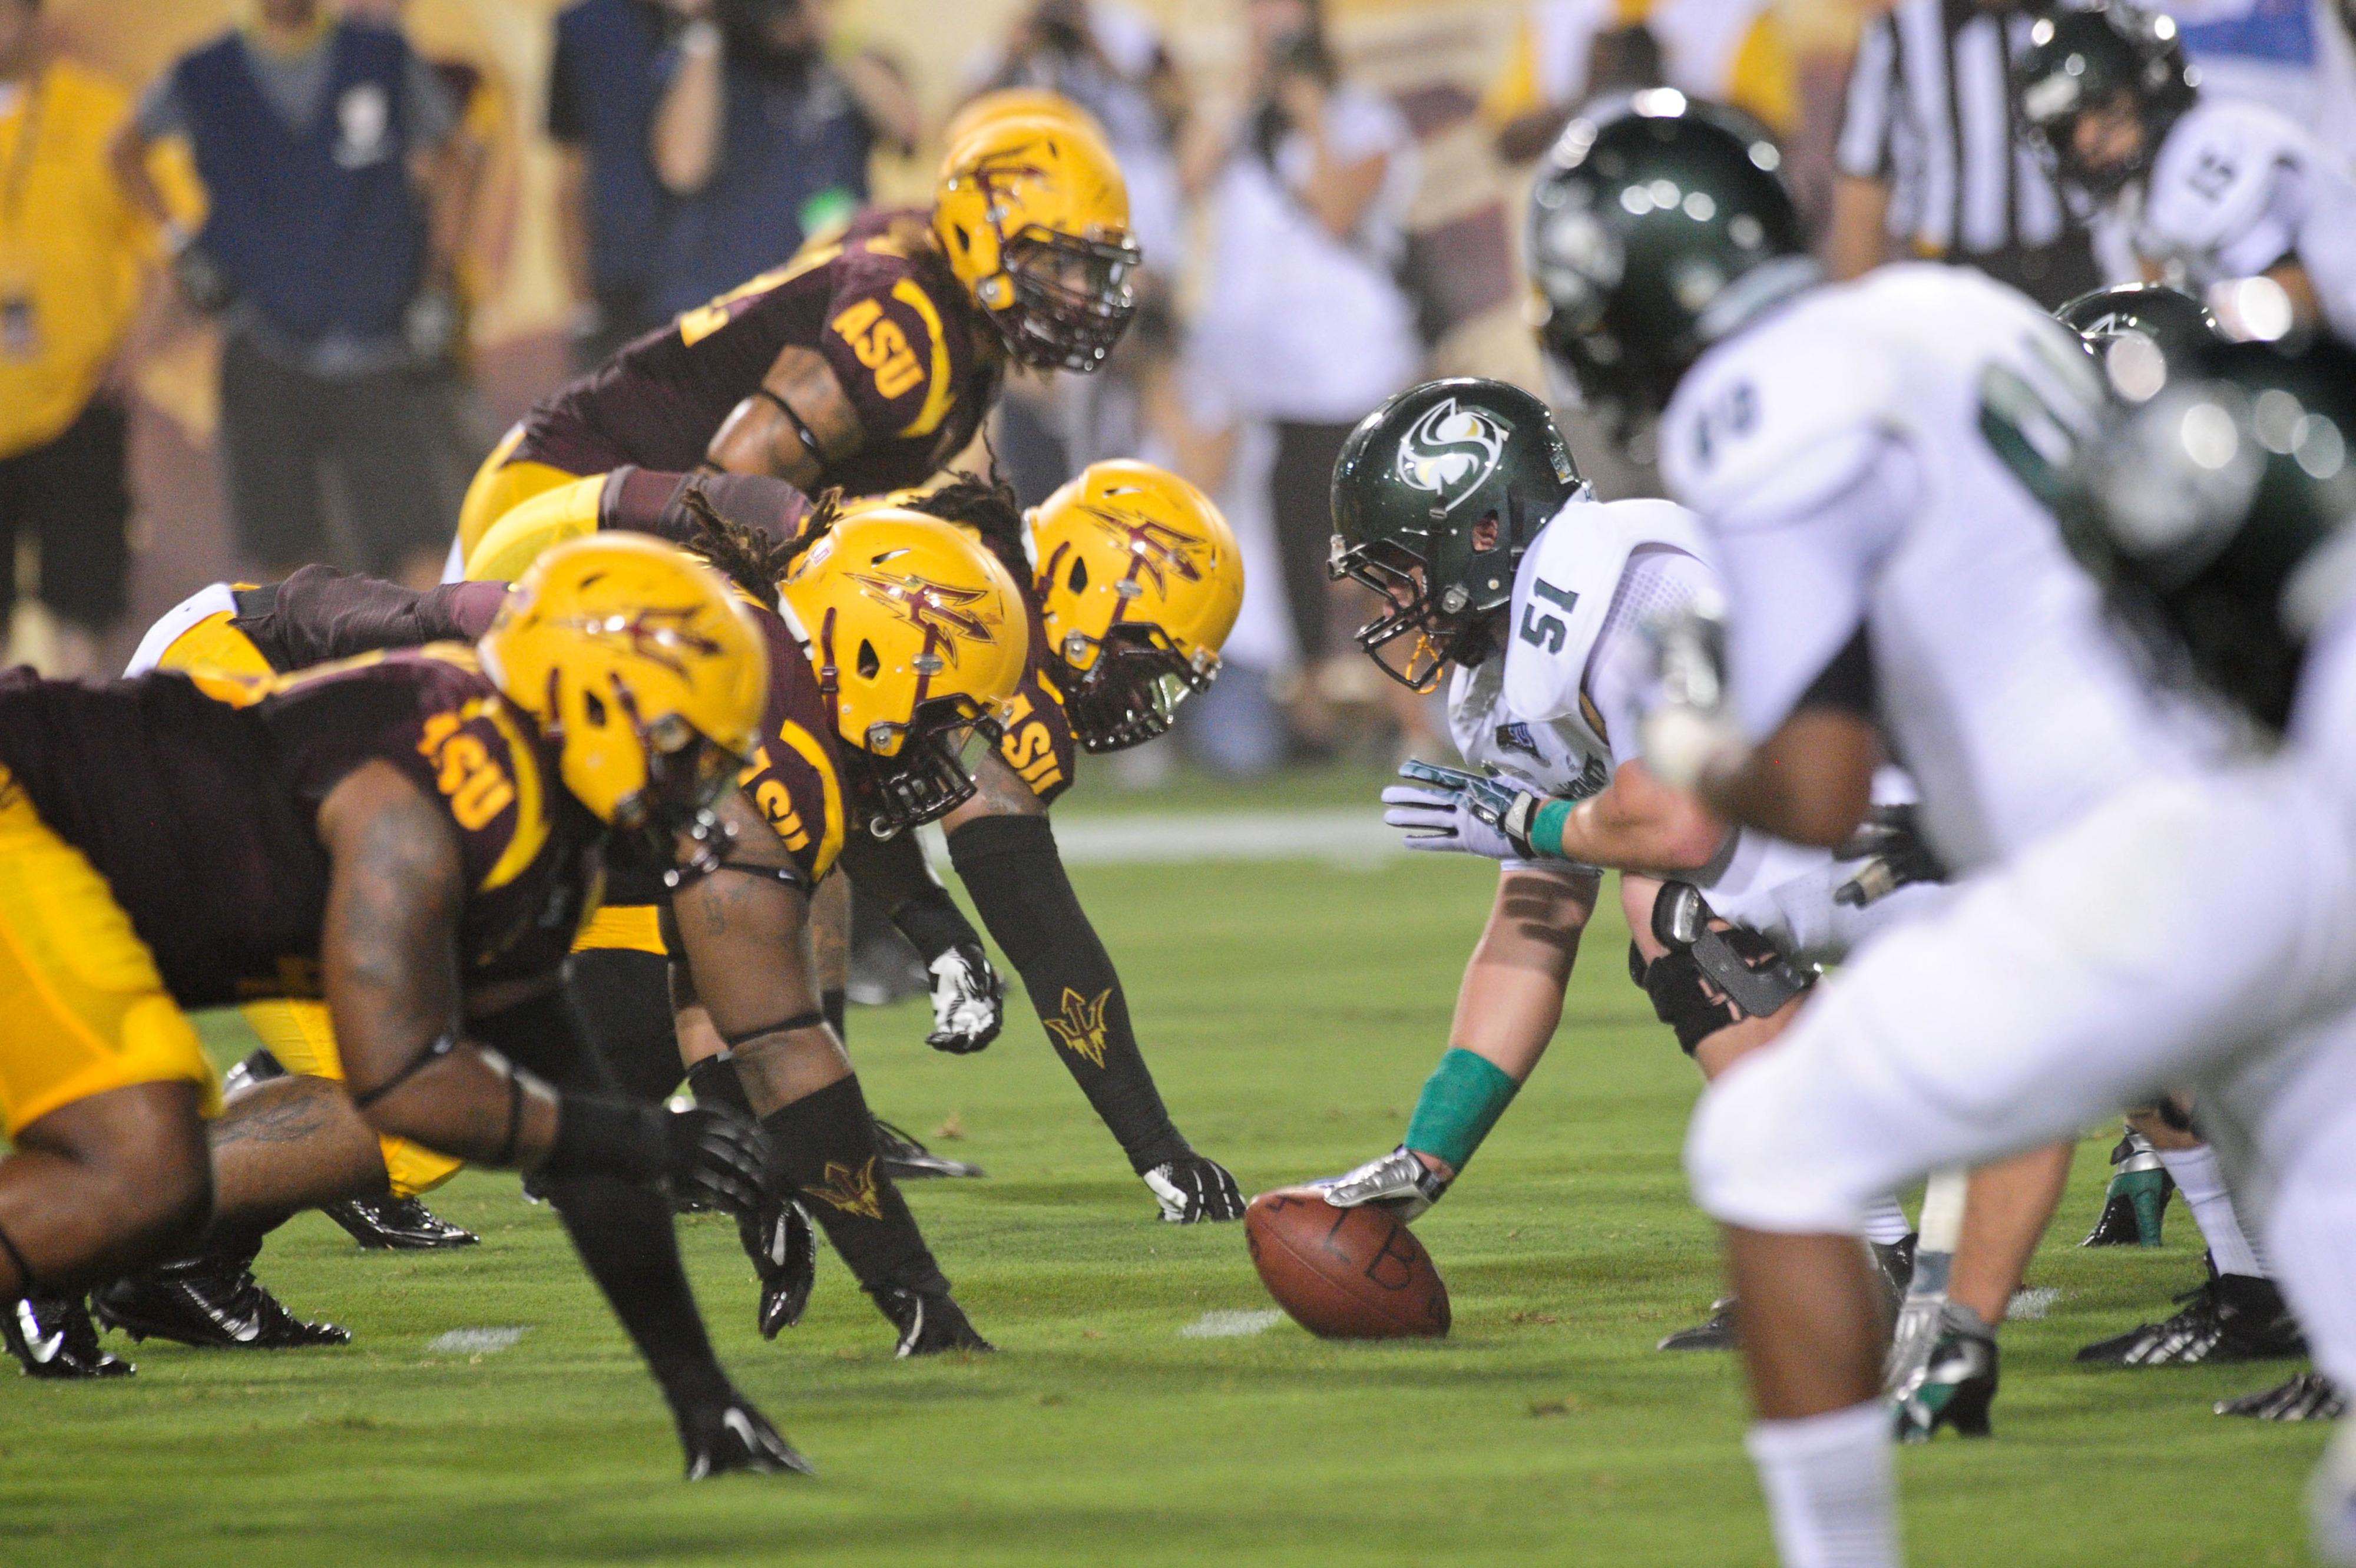 The defensive line shut down the run against Sacramento State.